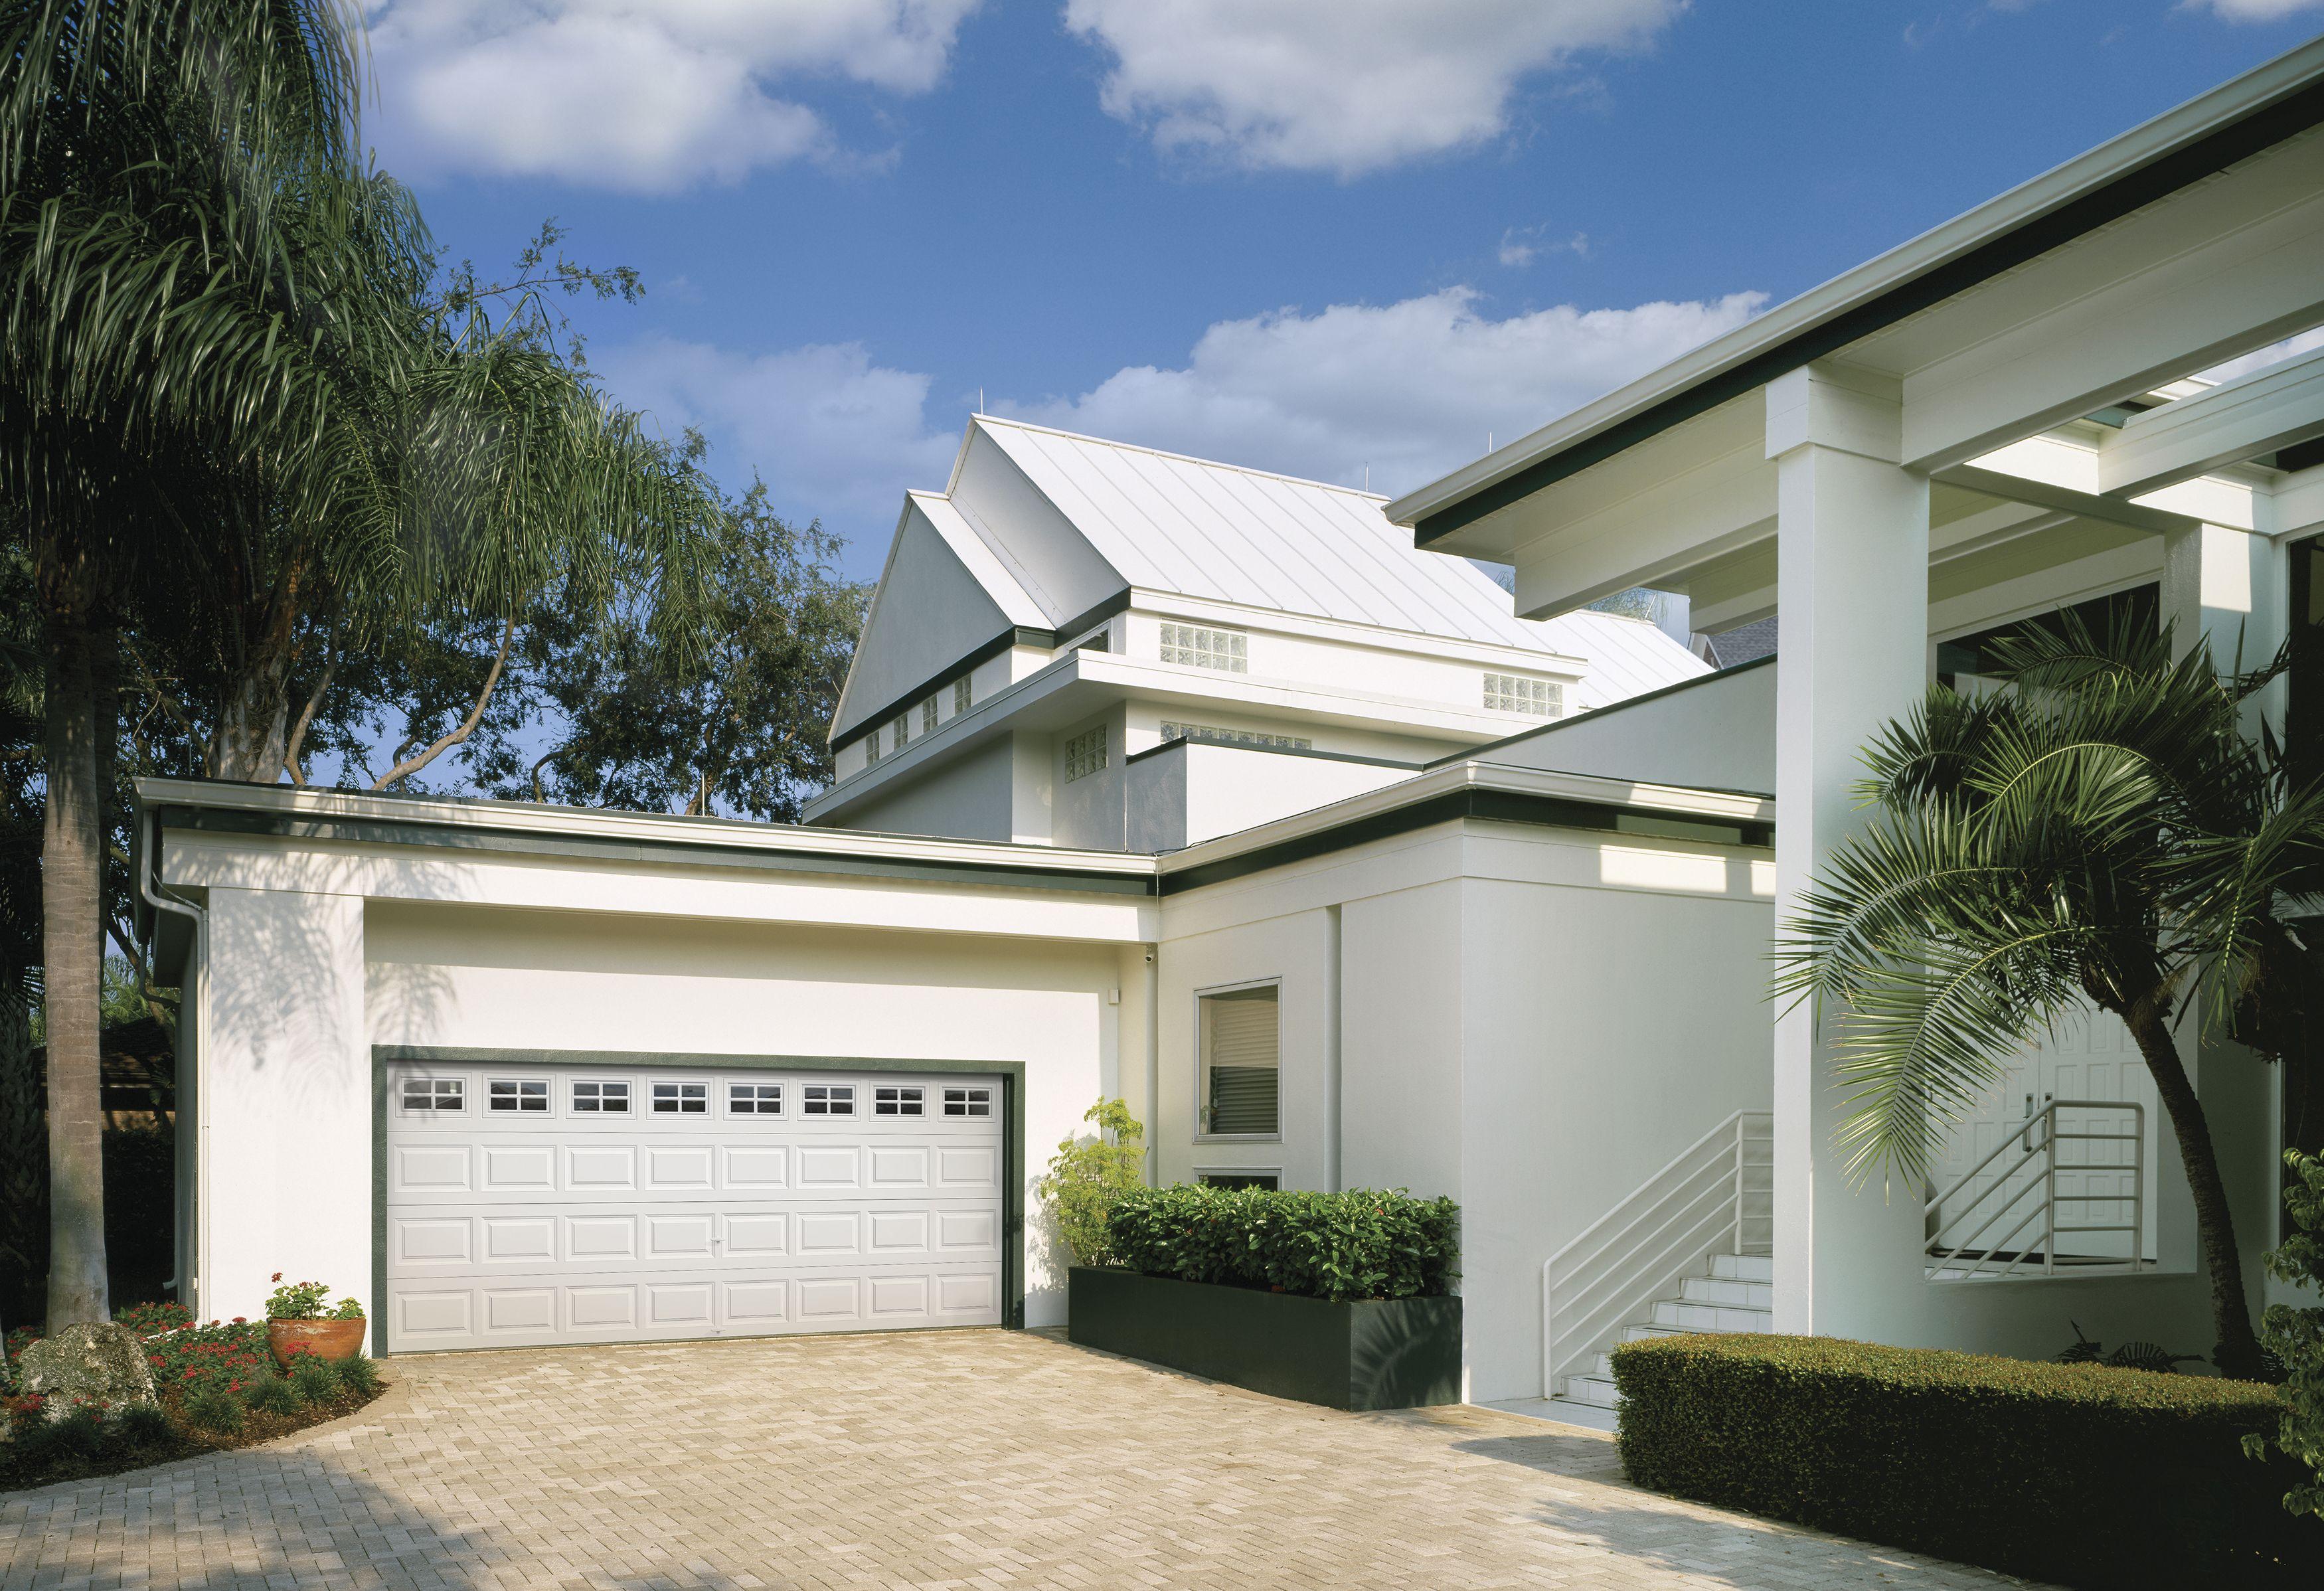 Pin By Banko Overhead Doors Inc On Residential Garage Doors